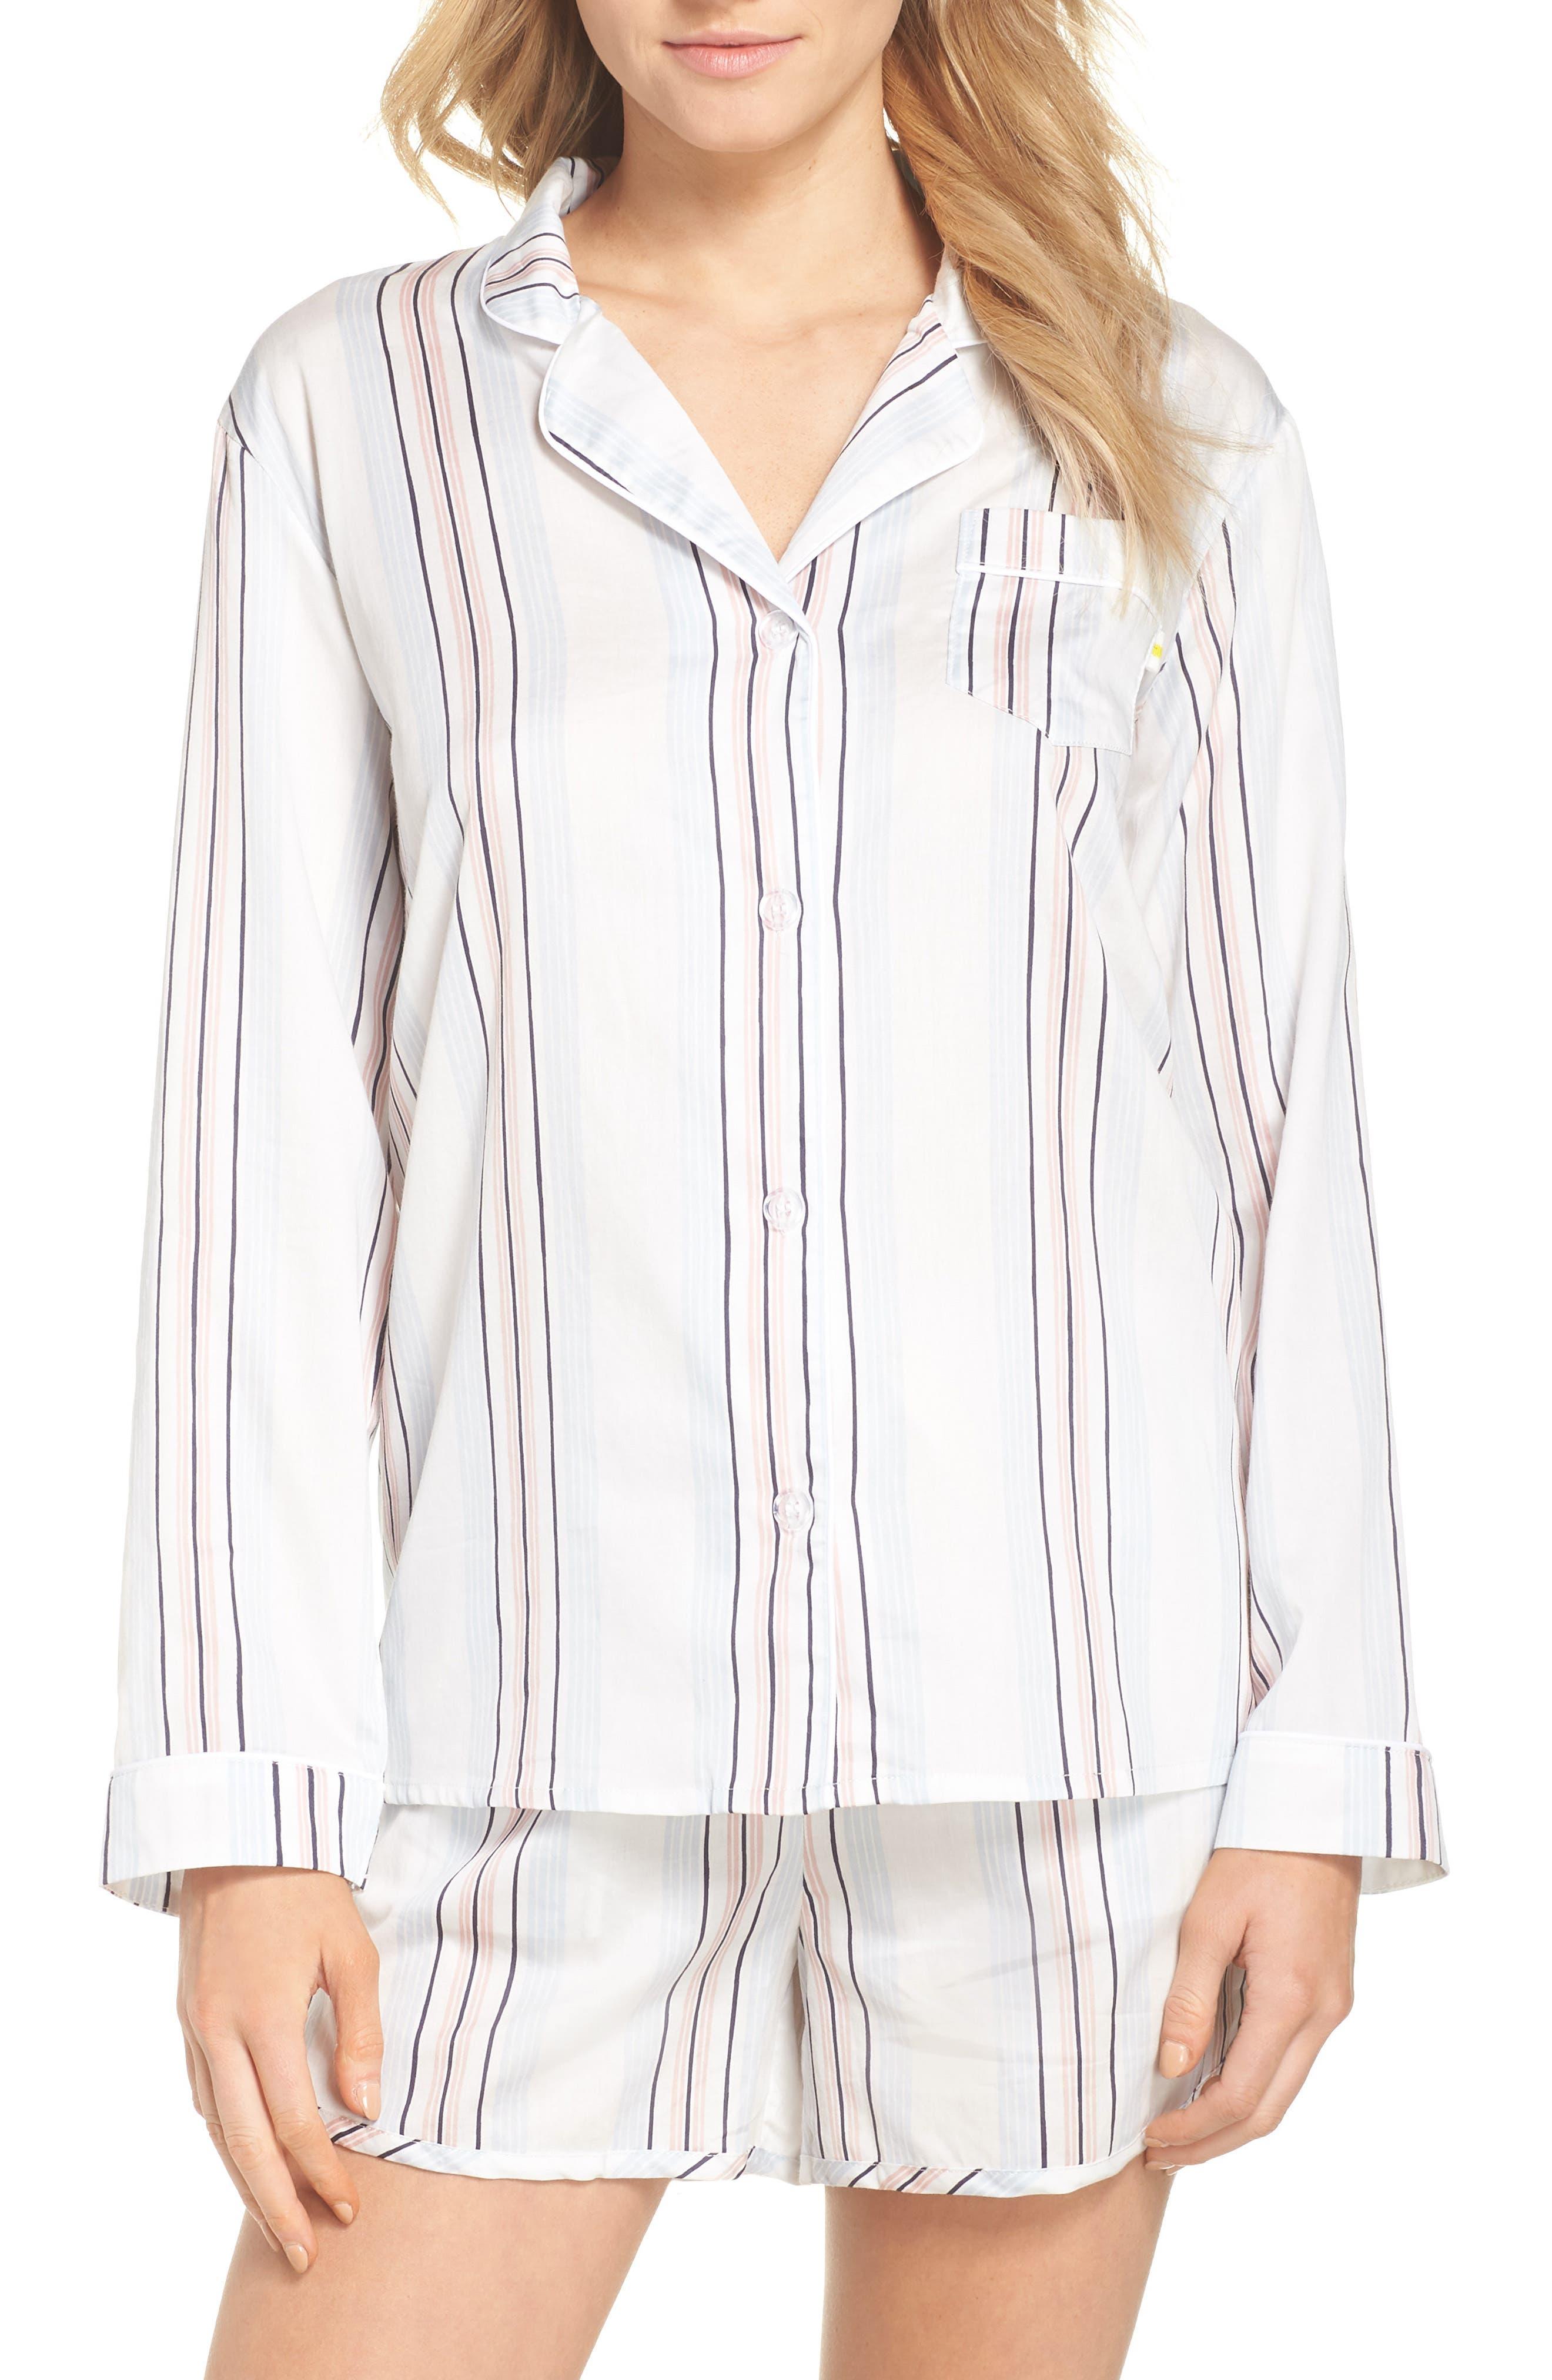 Chalmers Candy Stripe Short Pajamas